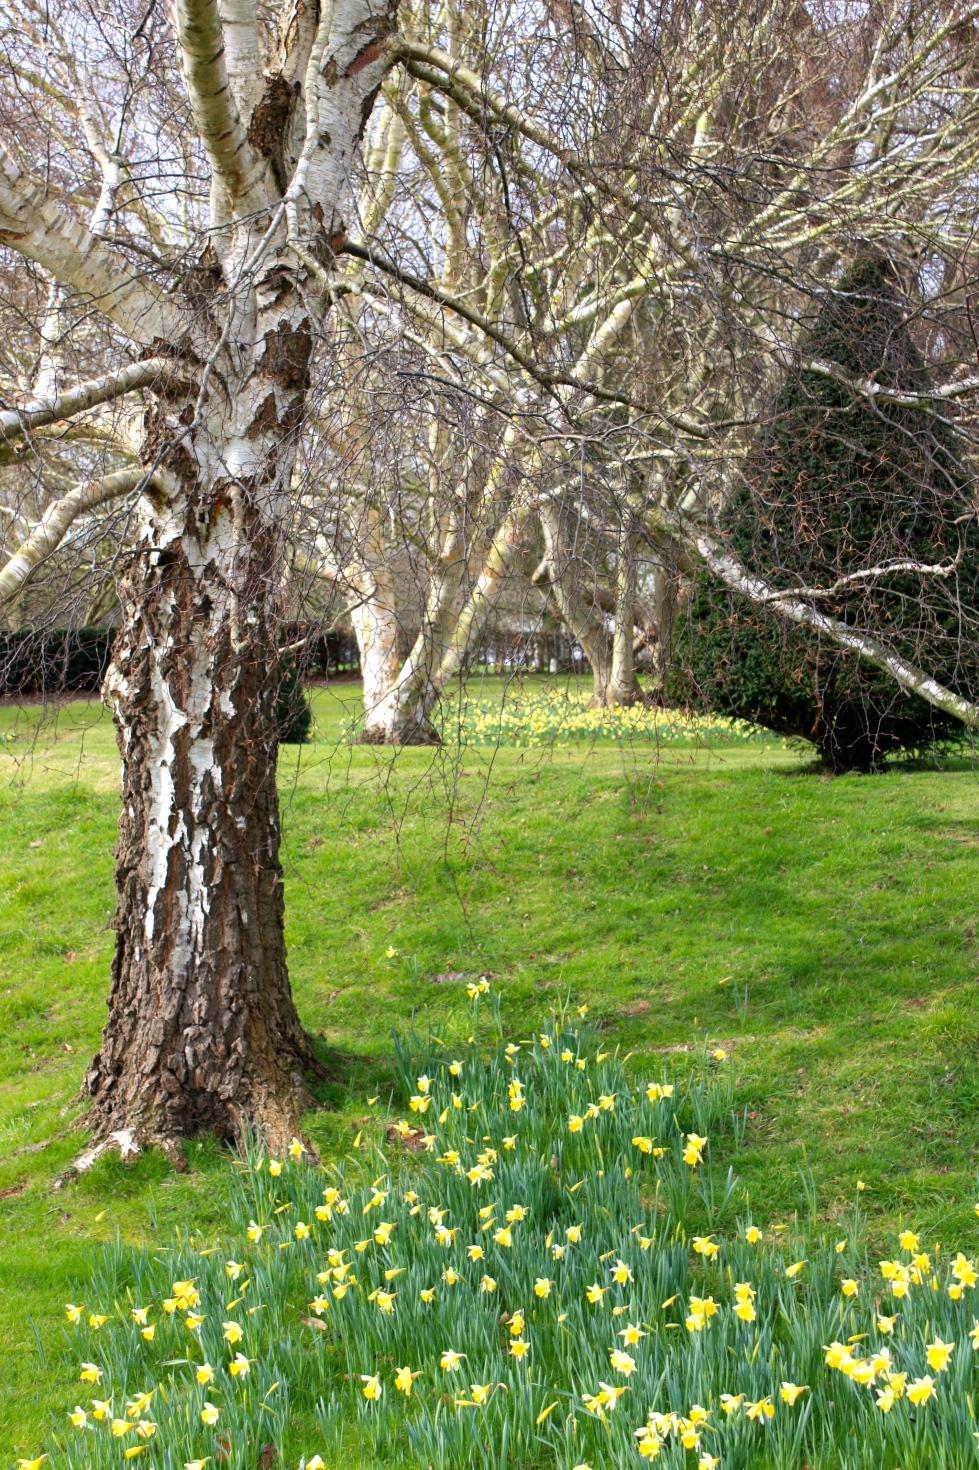 birches and narcissi, Goodnestone Park, February 2016